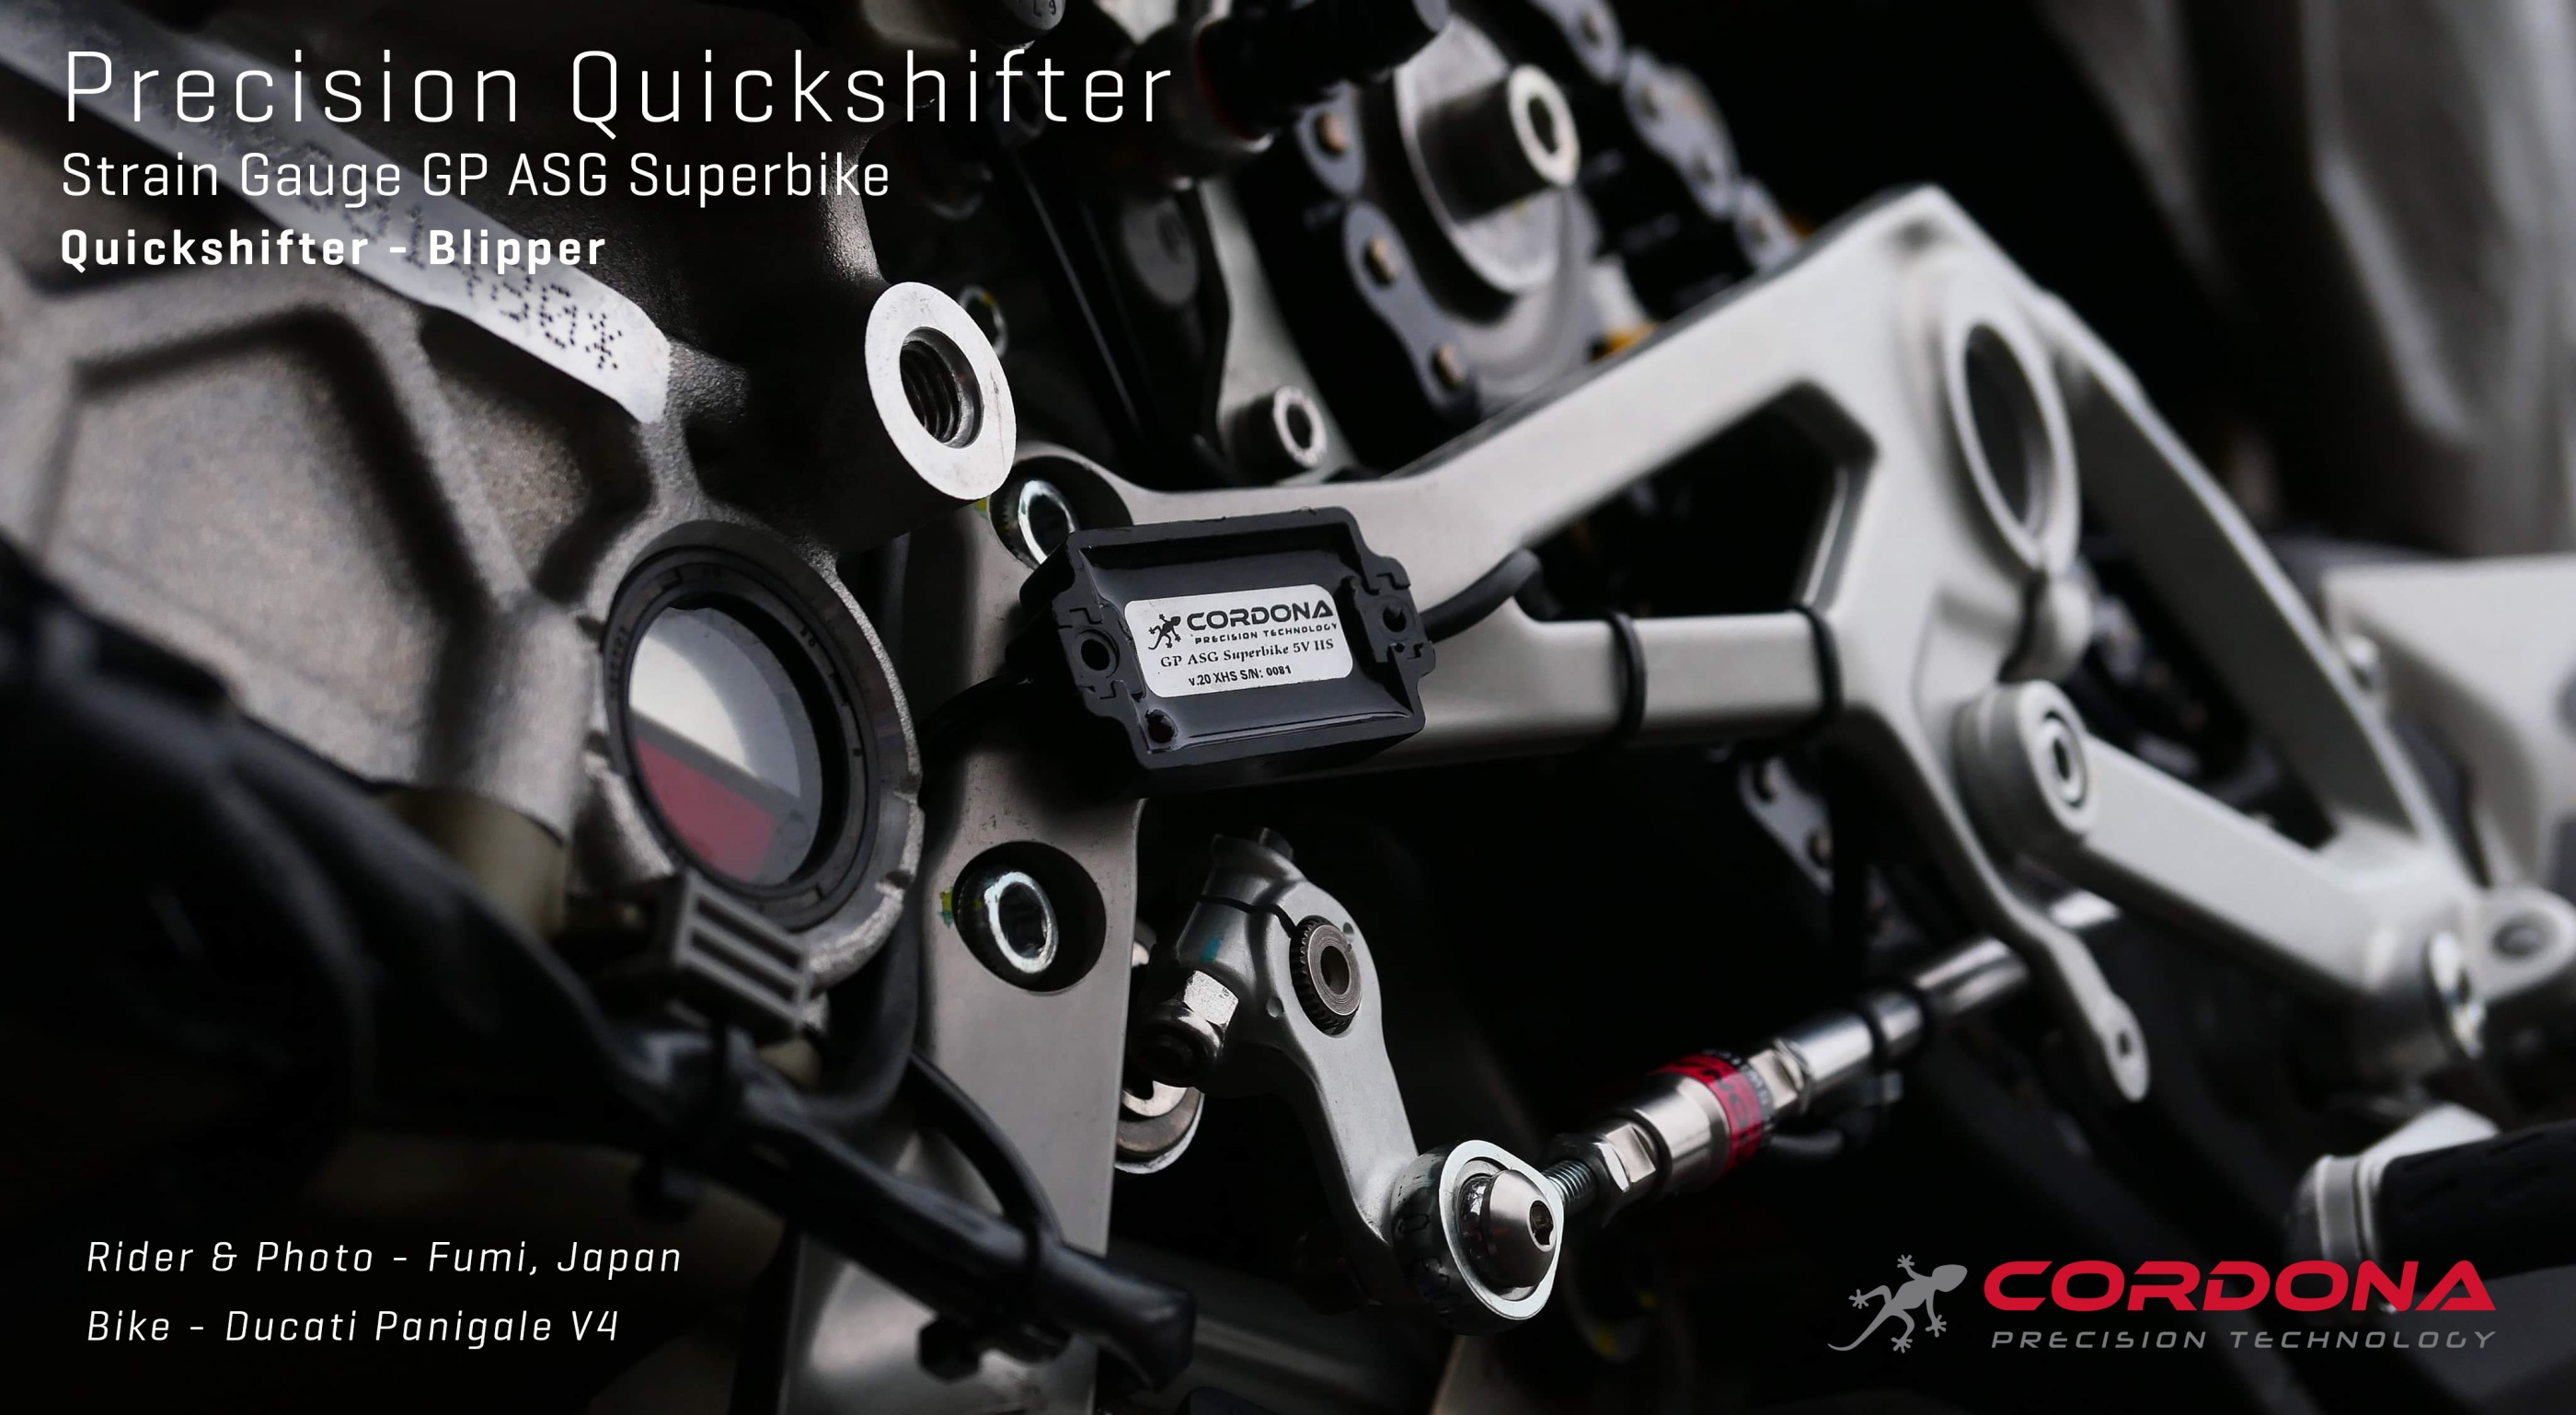 Ducati V4S Fumi Japan